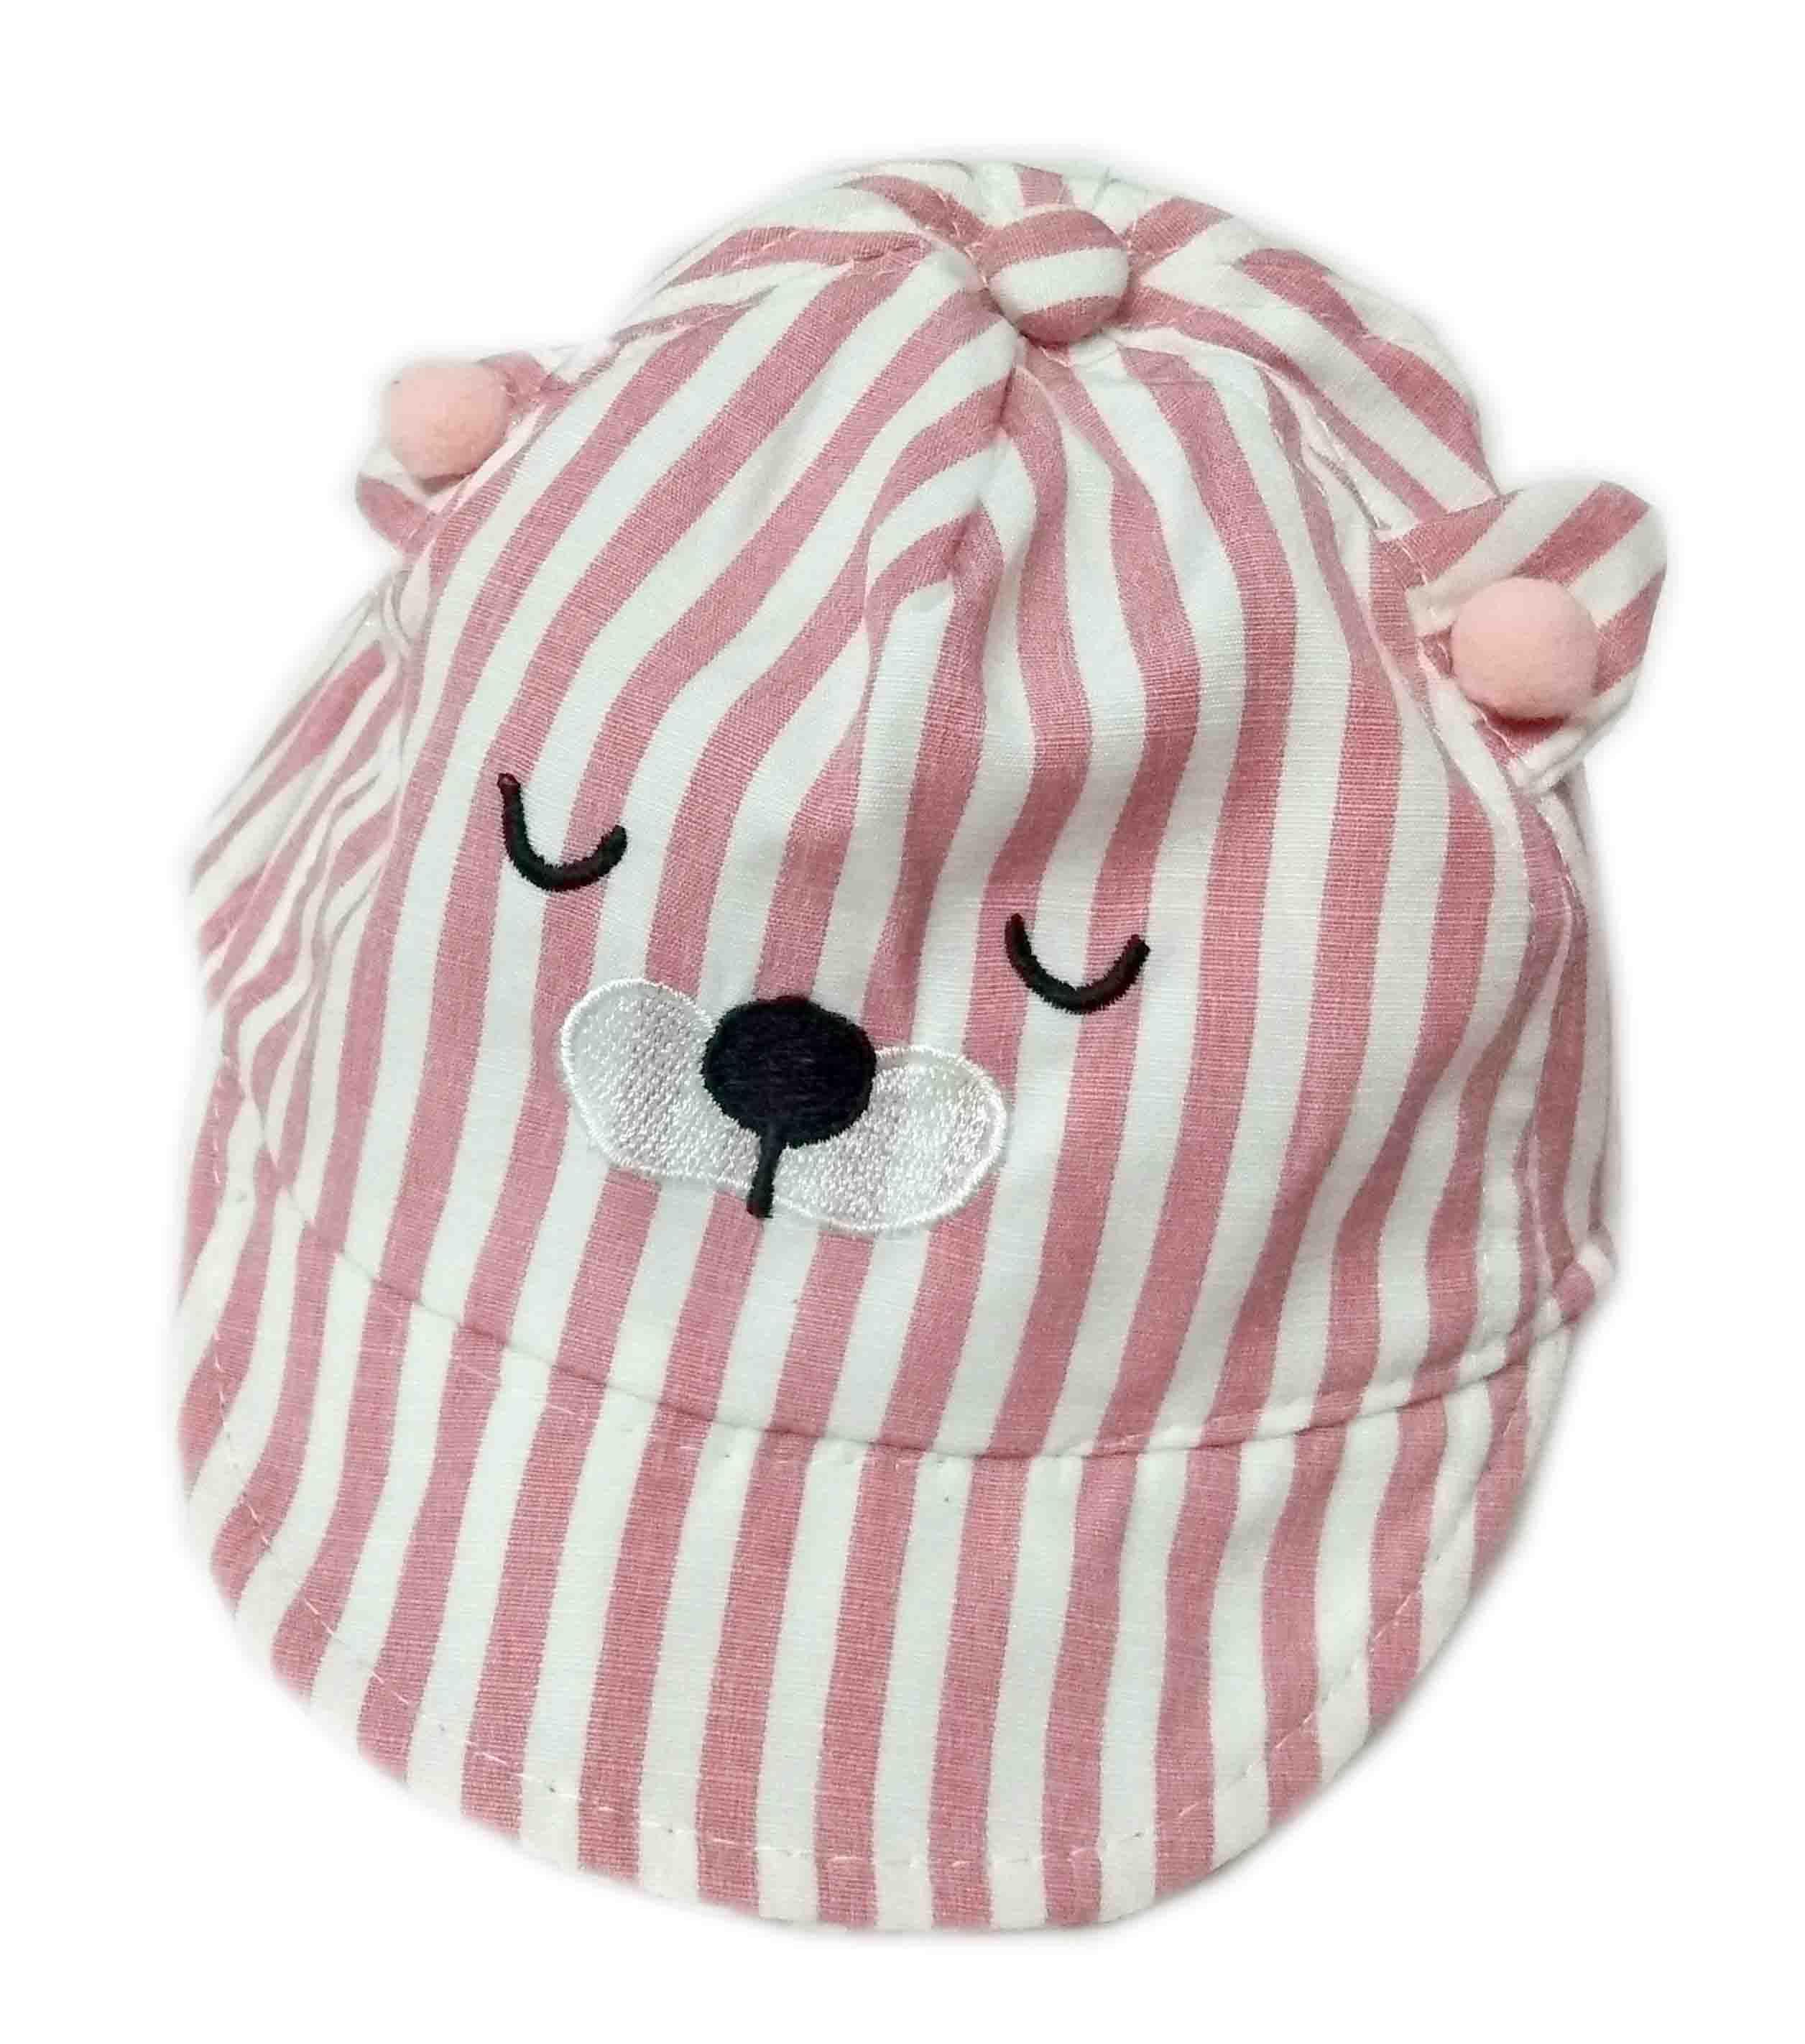 Squnibee Kids Cap (Pink)